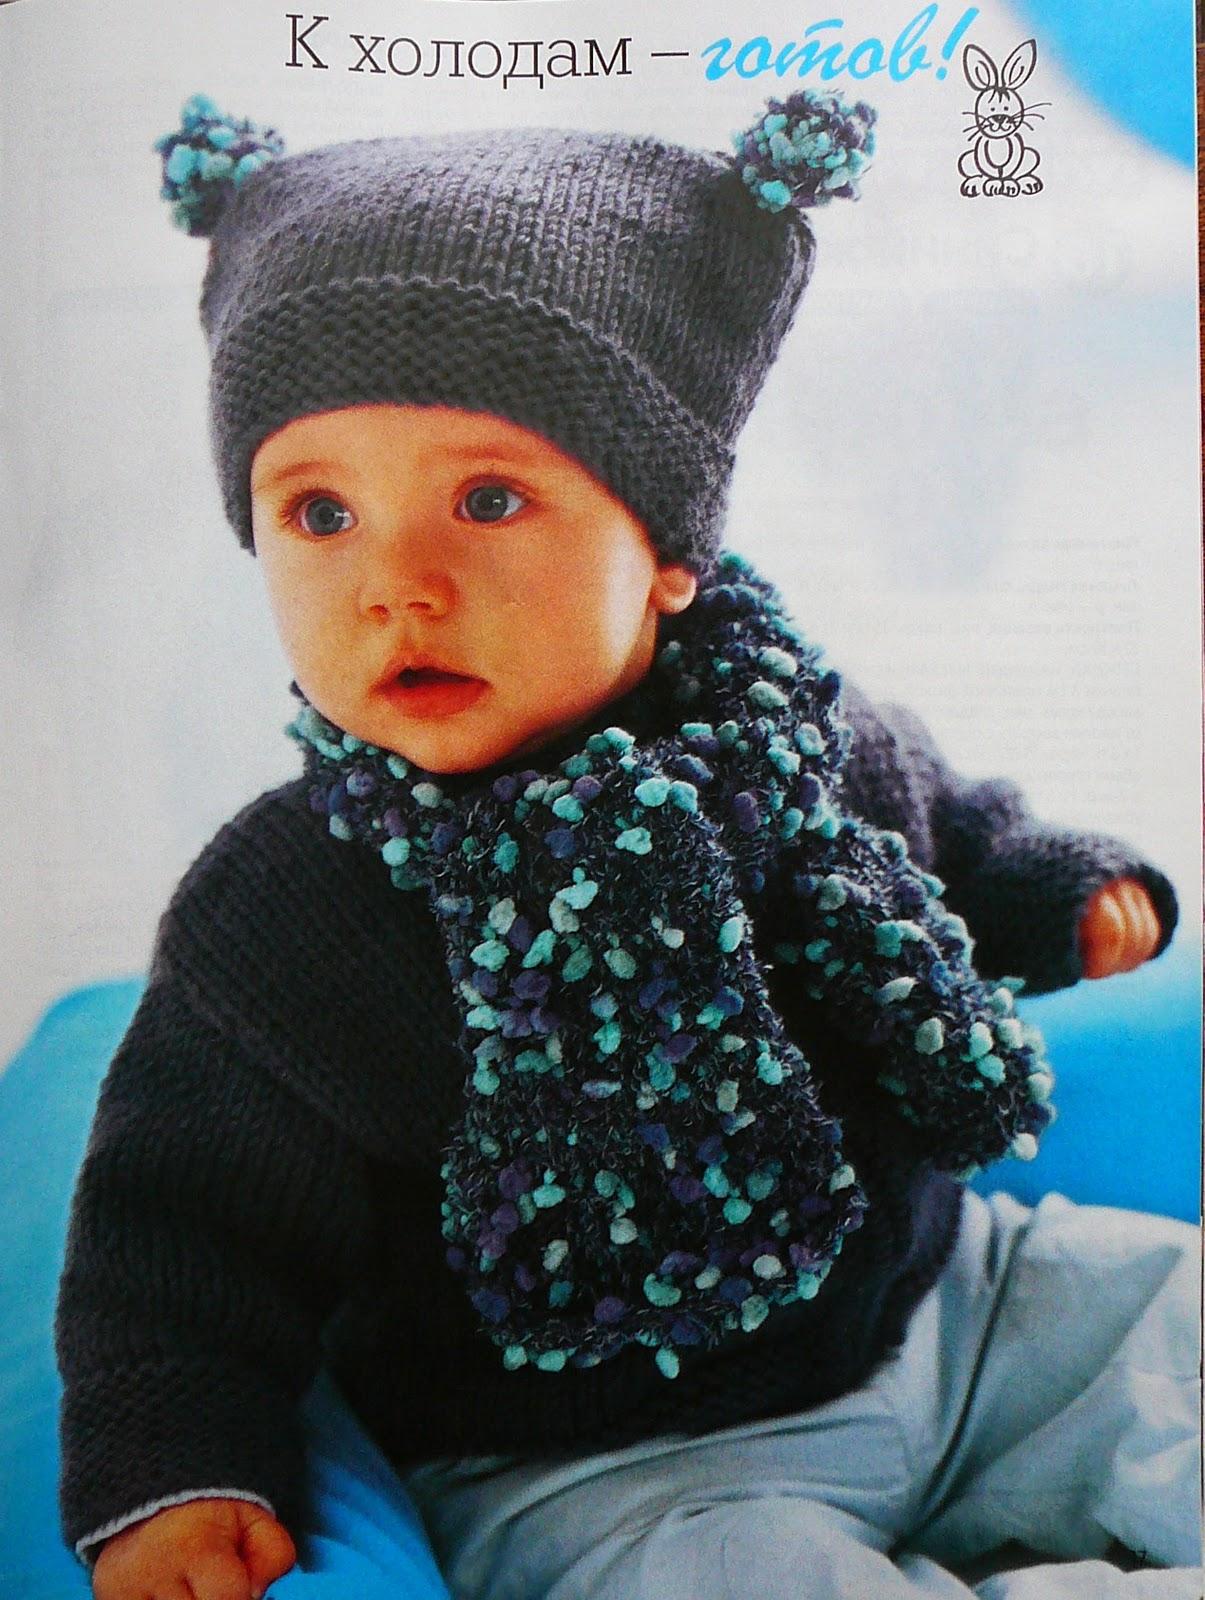 Intensiveplusyqydax вязание детей шапочки мальчика